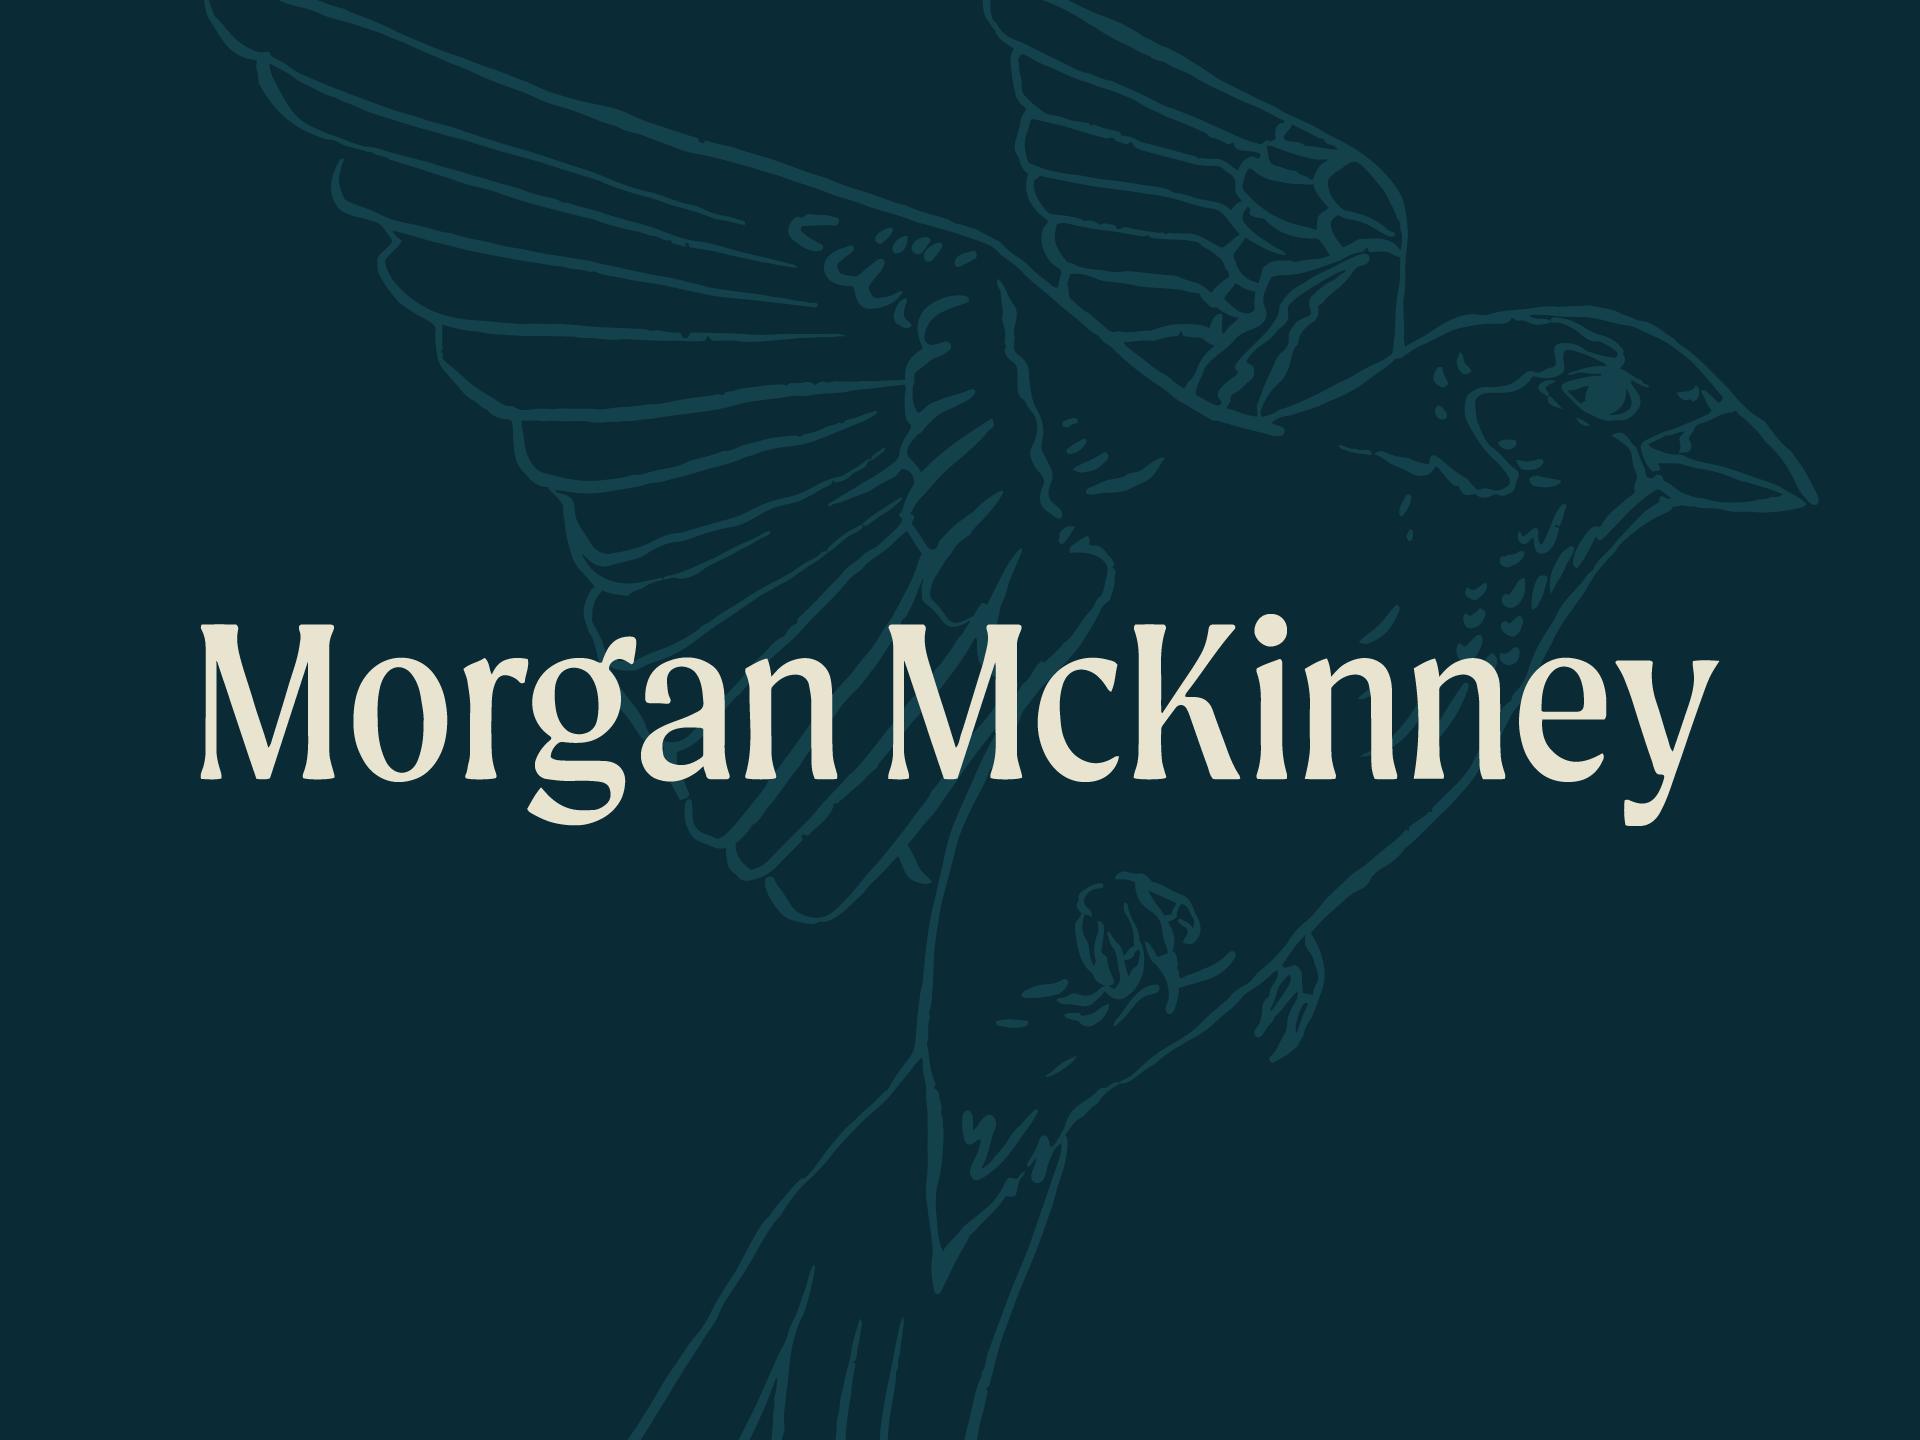 Morgan McKinney